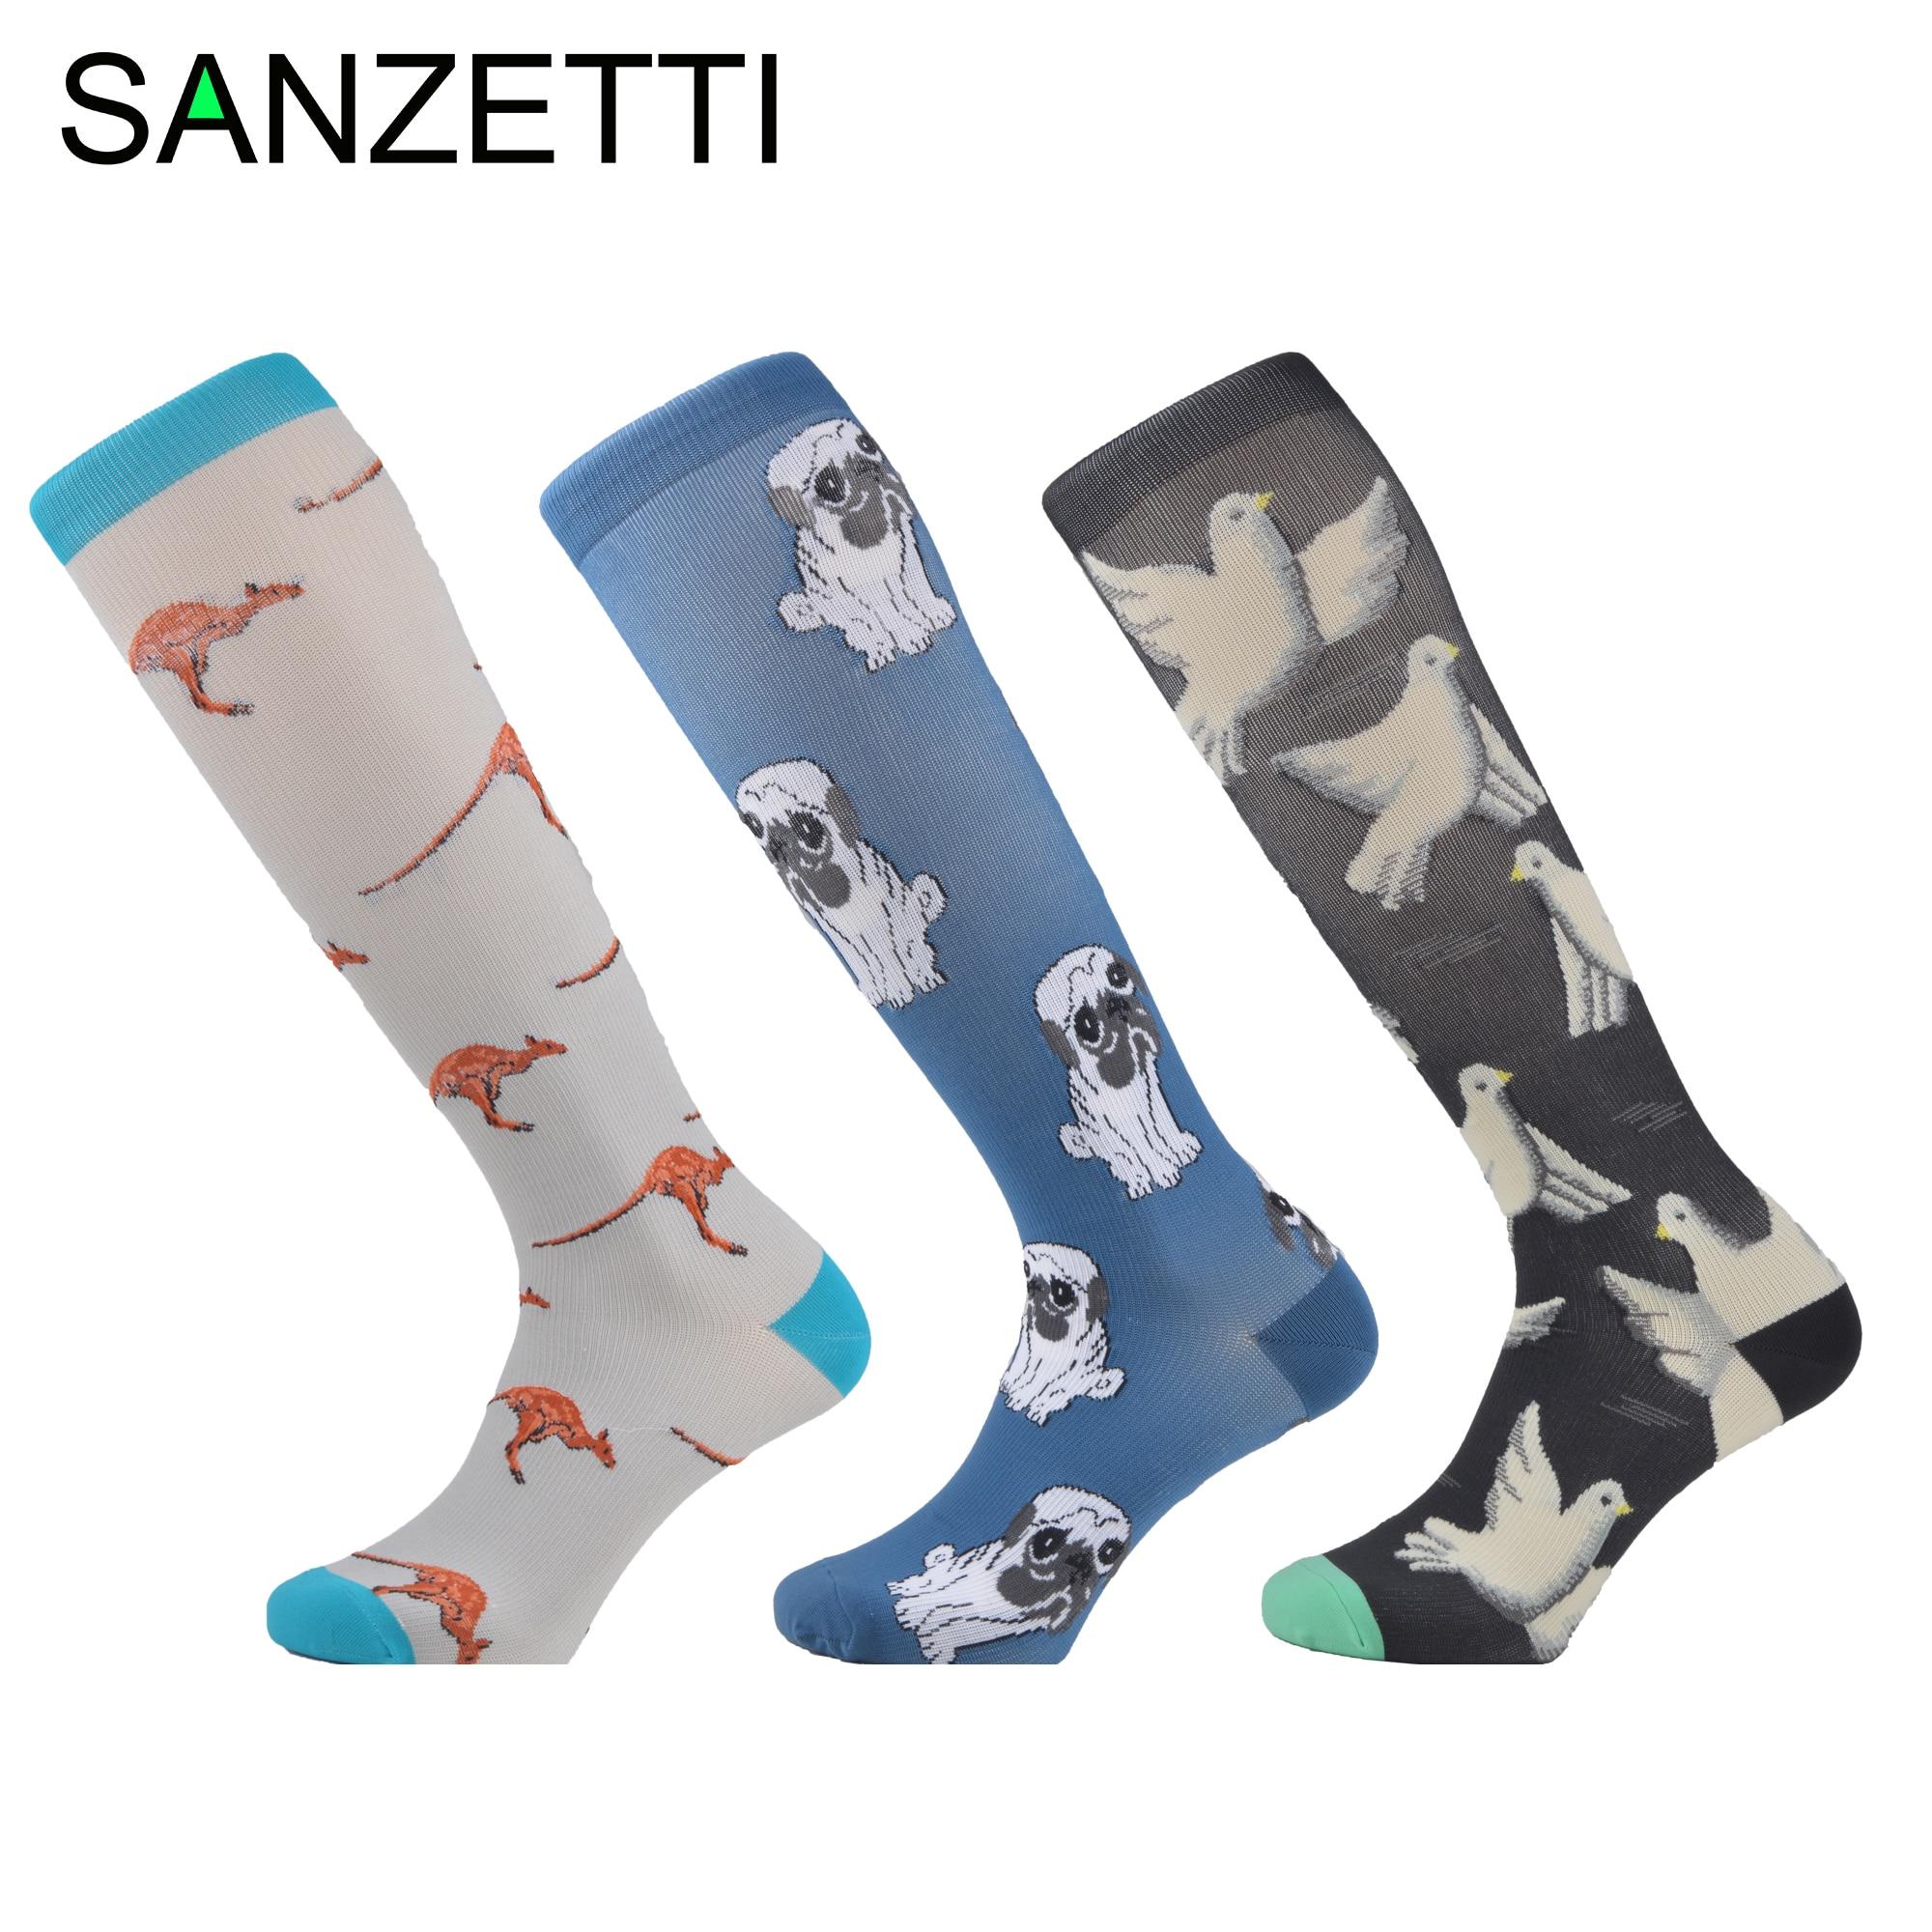 SANZETTI 3Pairs/Lot Women's Hayyp Animal Leg Support Stretch Combed Cotton Compression Socks Below Knee Anti-Fatigue Happy Socks